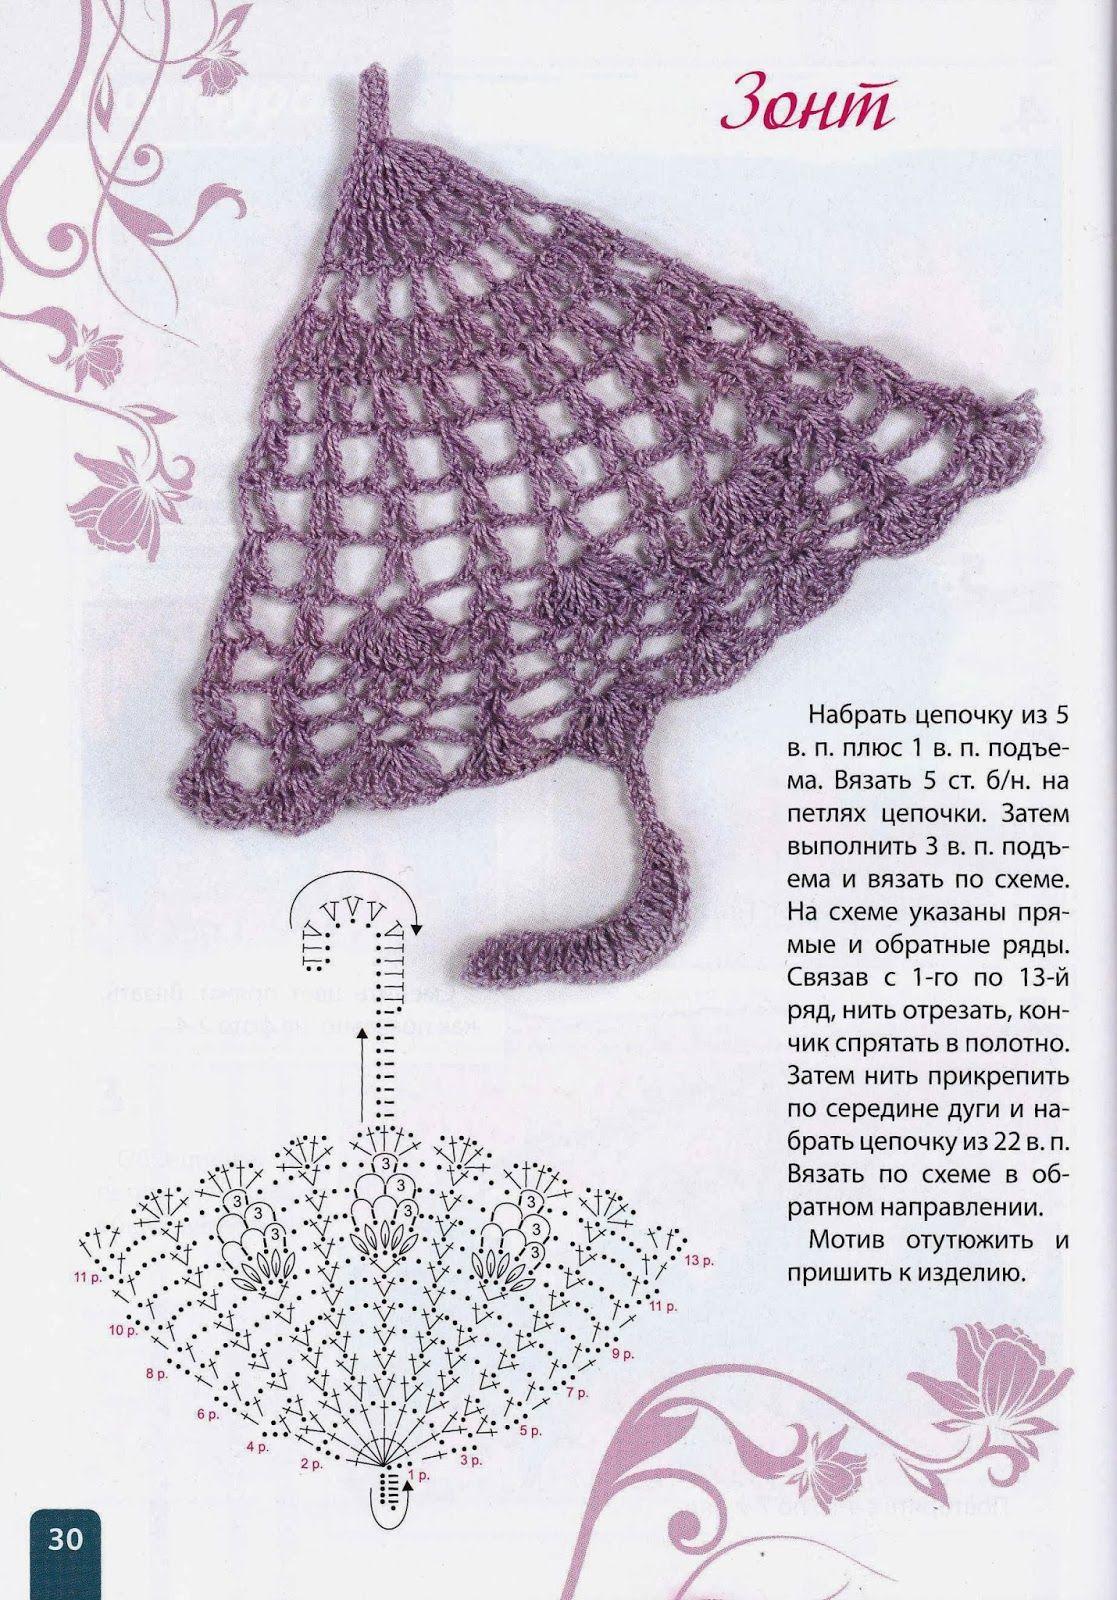 SOLO PUNTOS: Paraguitas | crochet .-. gráficos - diagramas ...